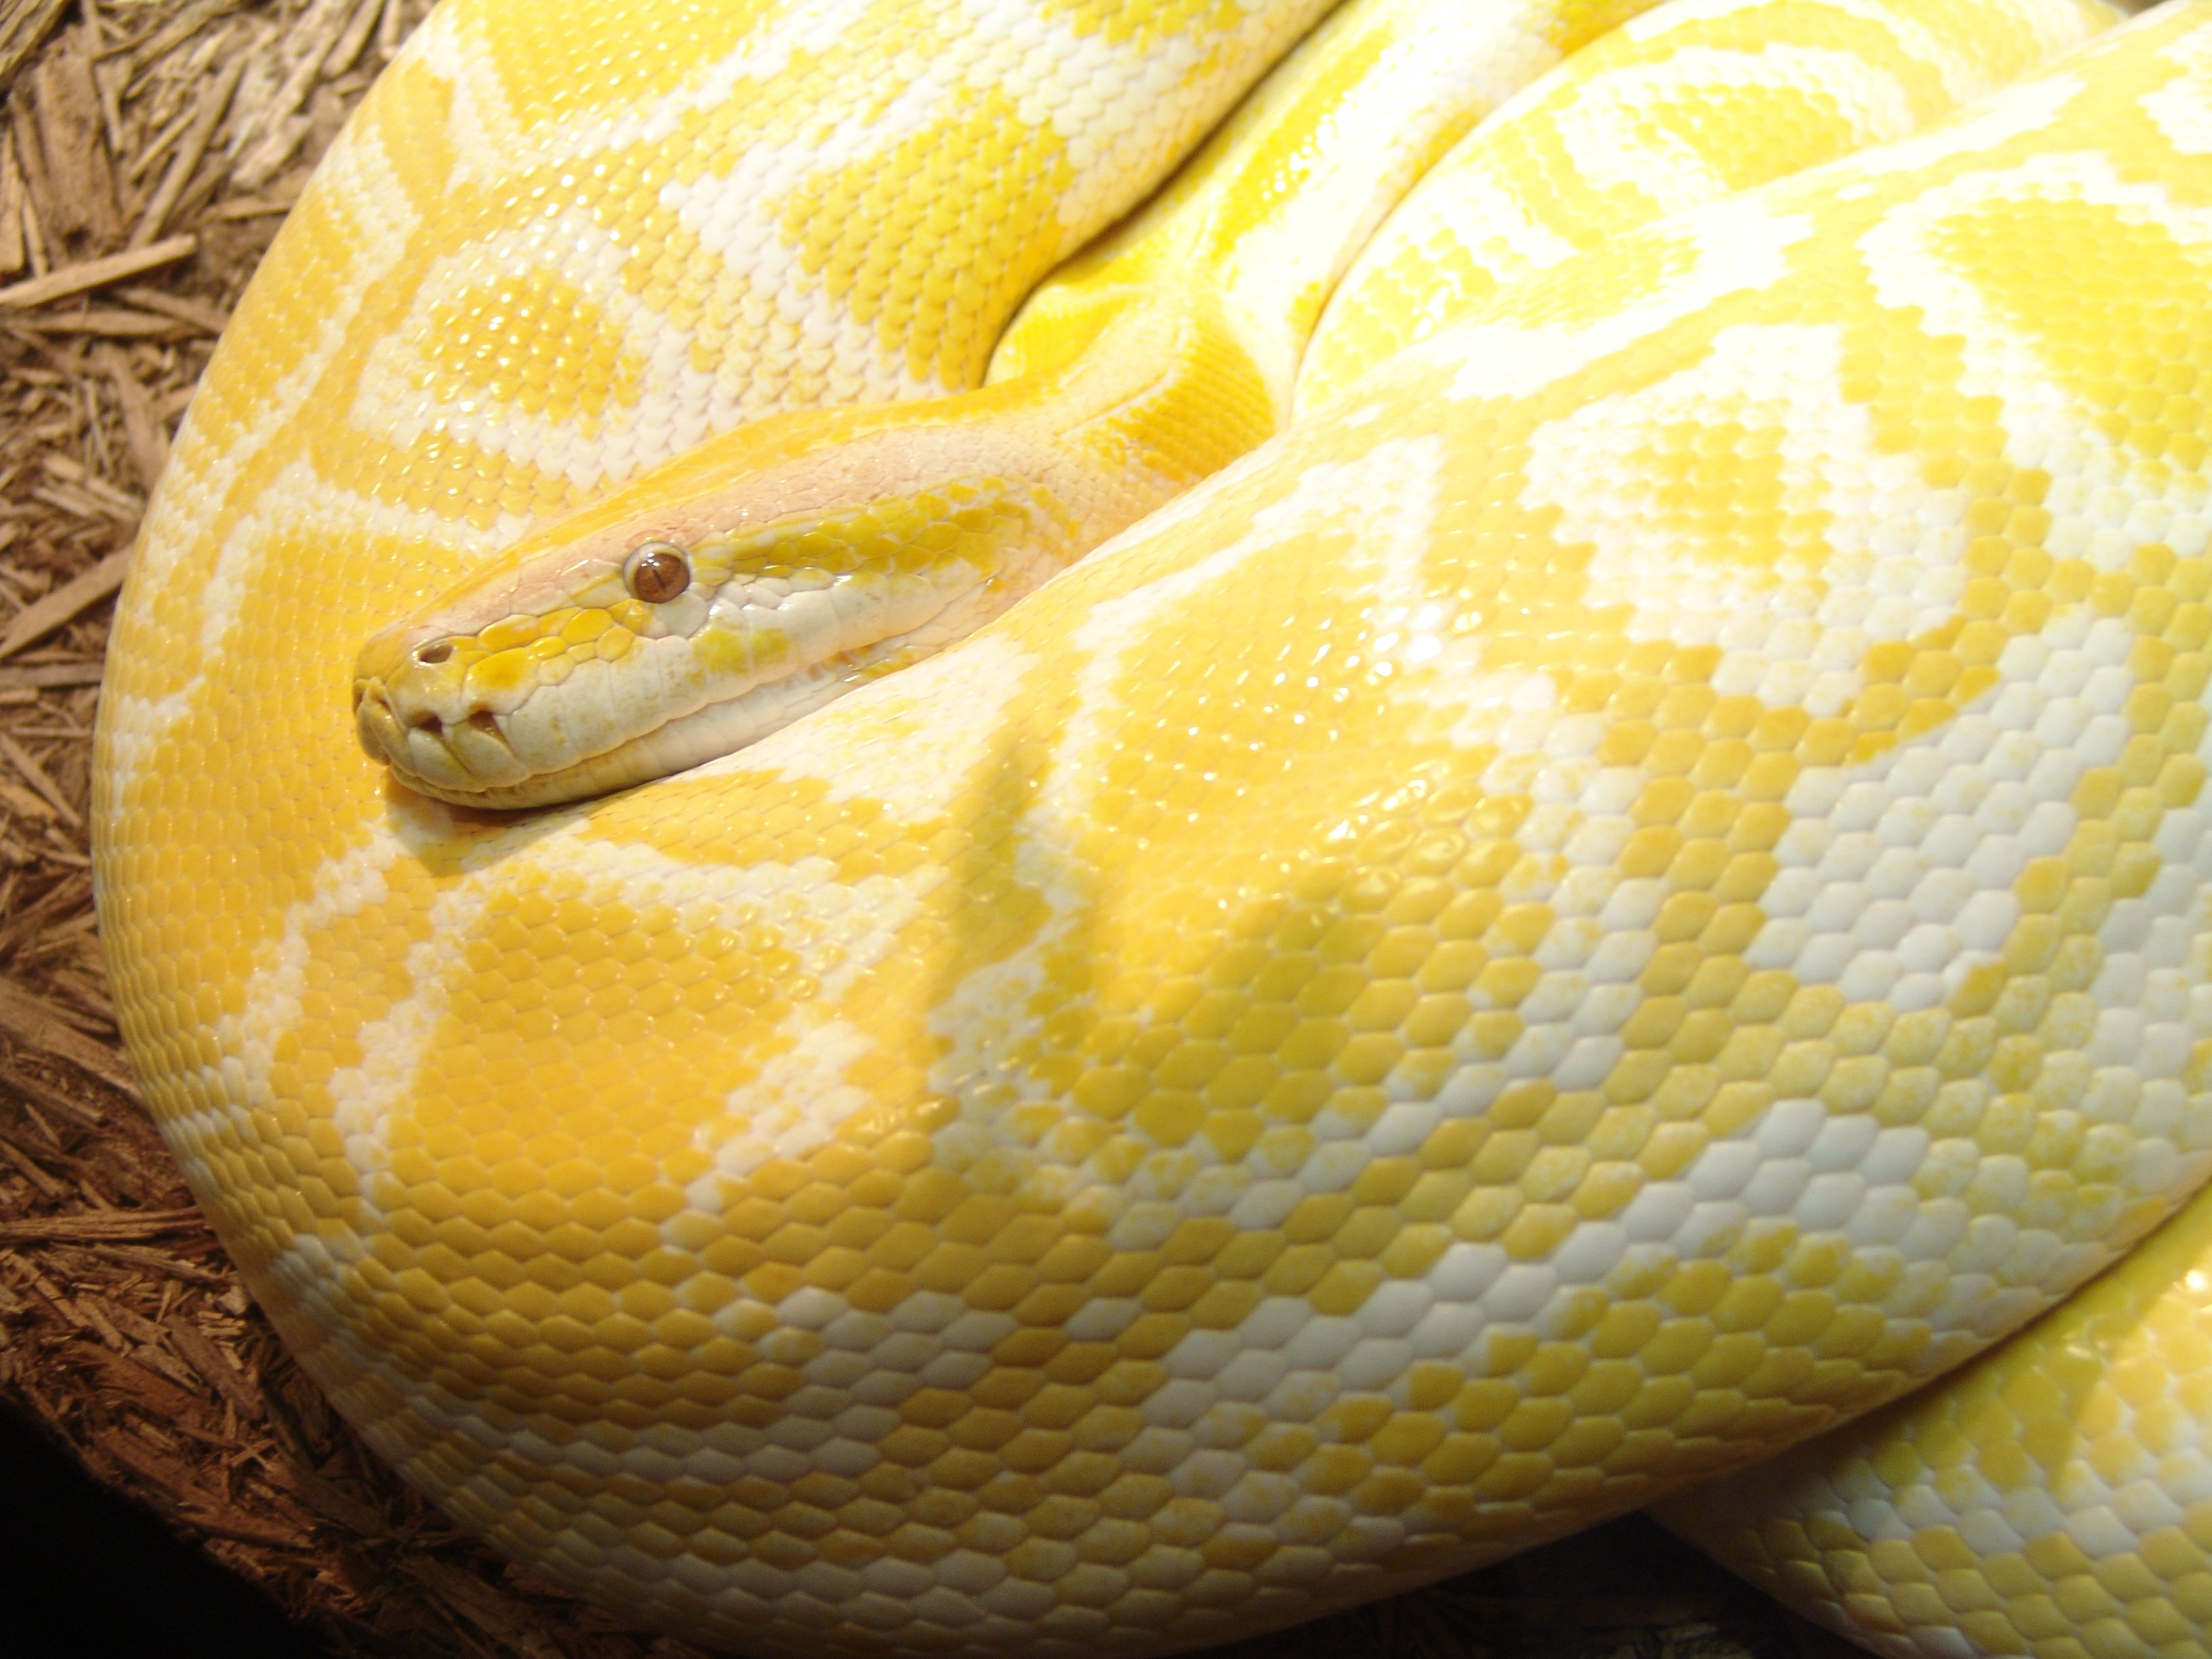 The Burmese Python is ...